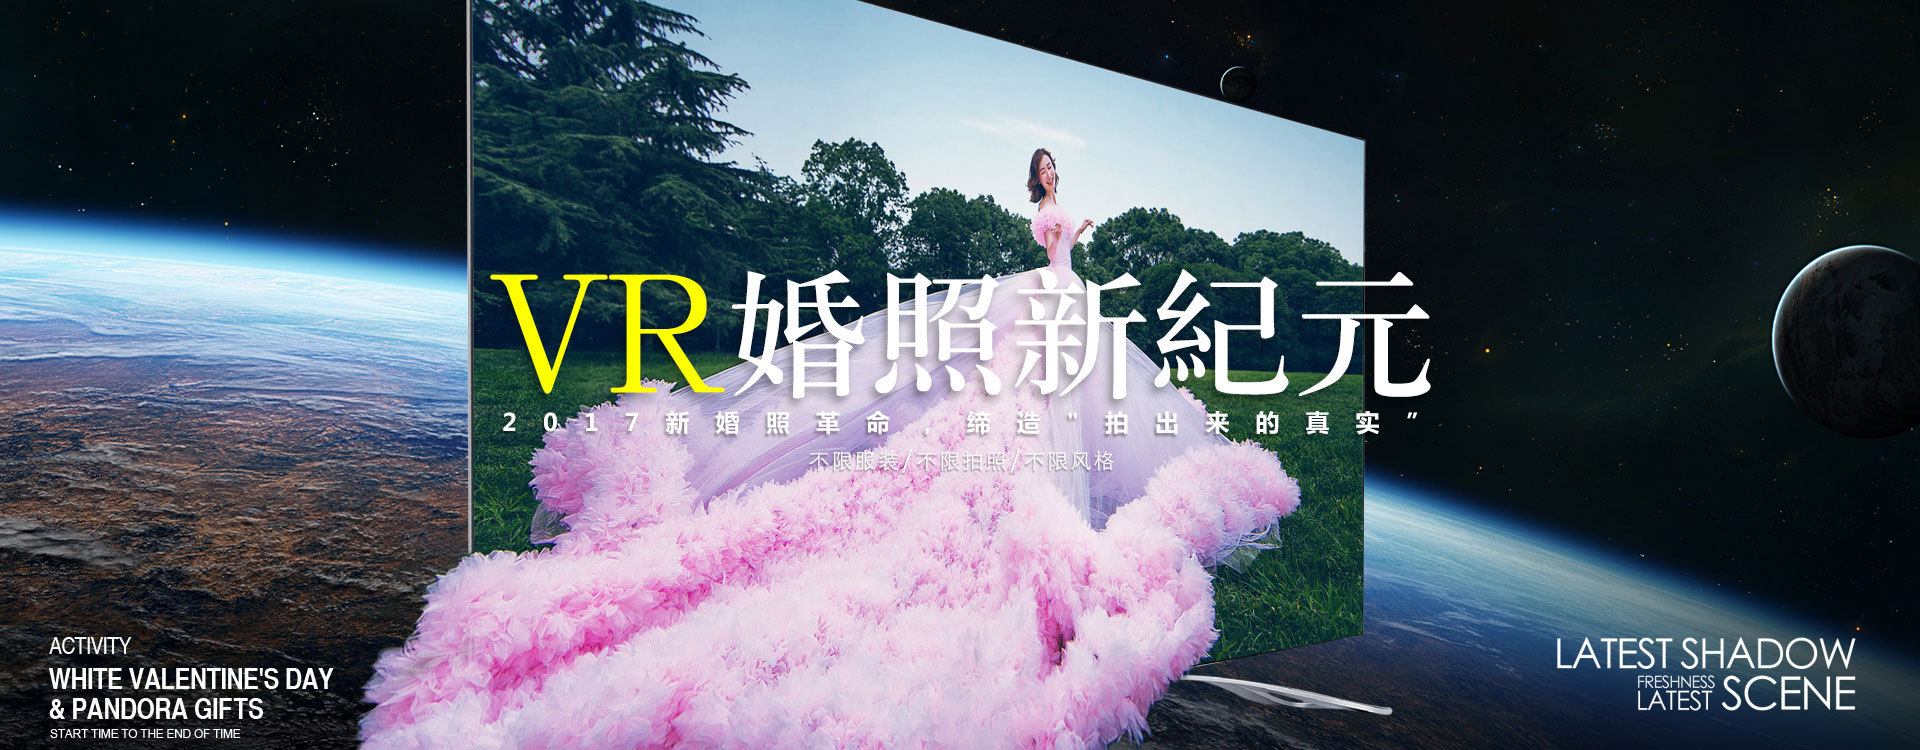 VR新纪元婚照新概念《5D高清》